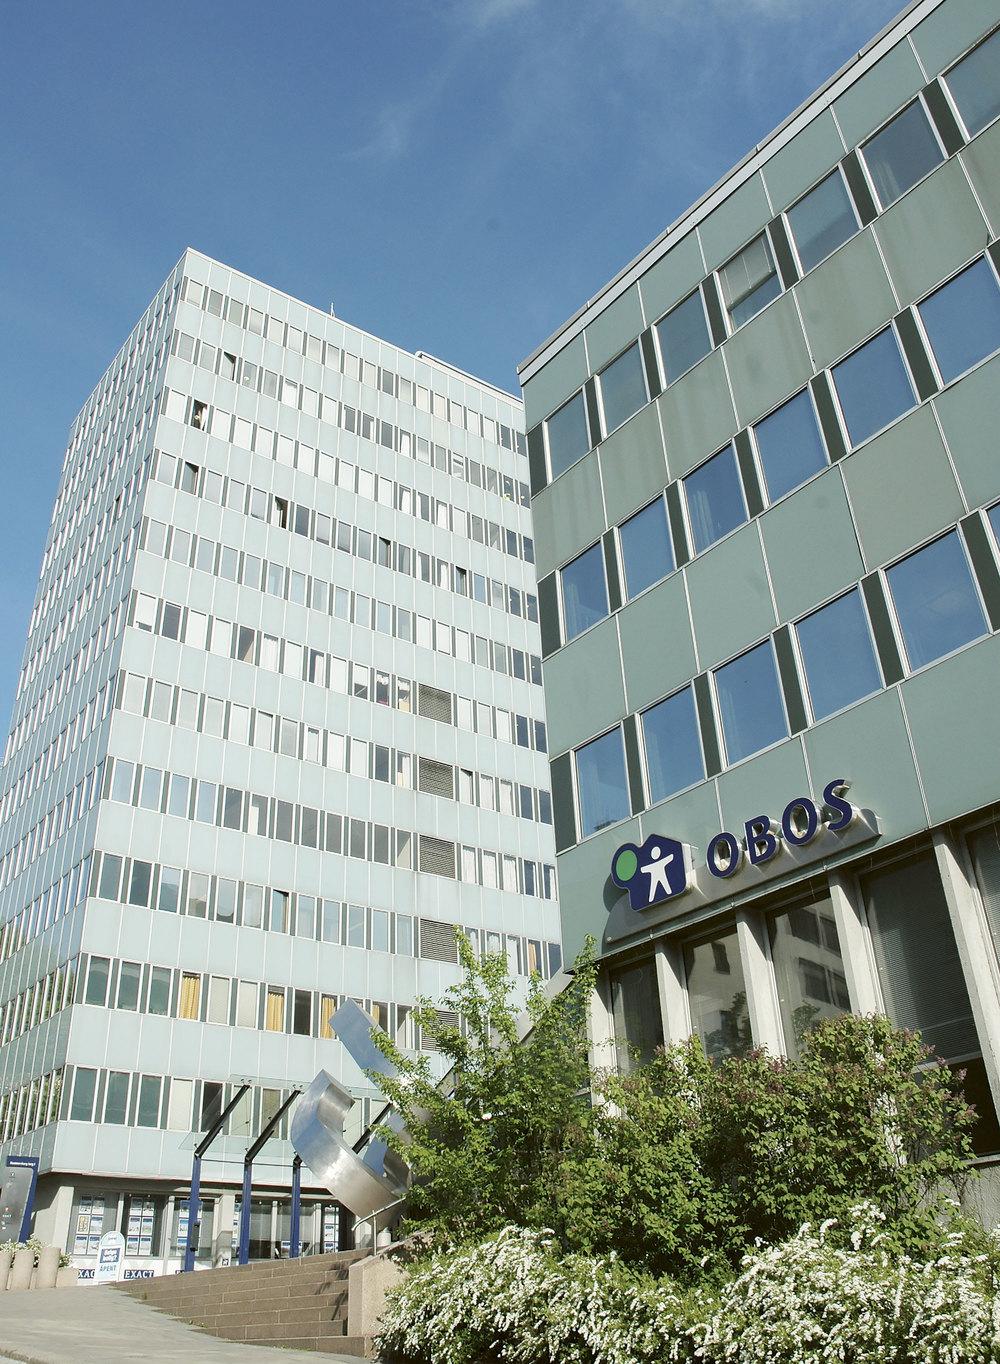 Høsten 2014 ble hovedkontoret til OBOS på Hammersborg torg i Oslo sertifisert som Miljøfyrtårn. Foto: Marie Dyrén.